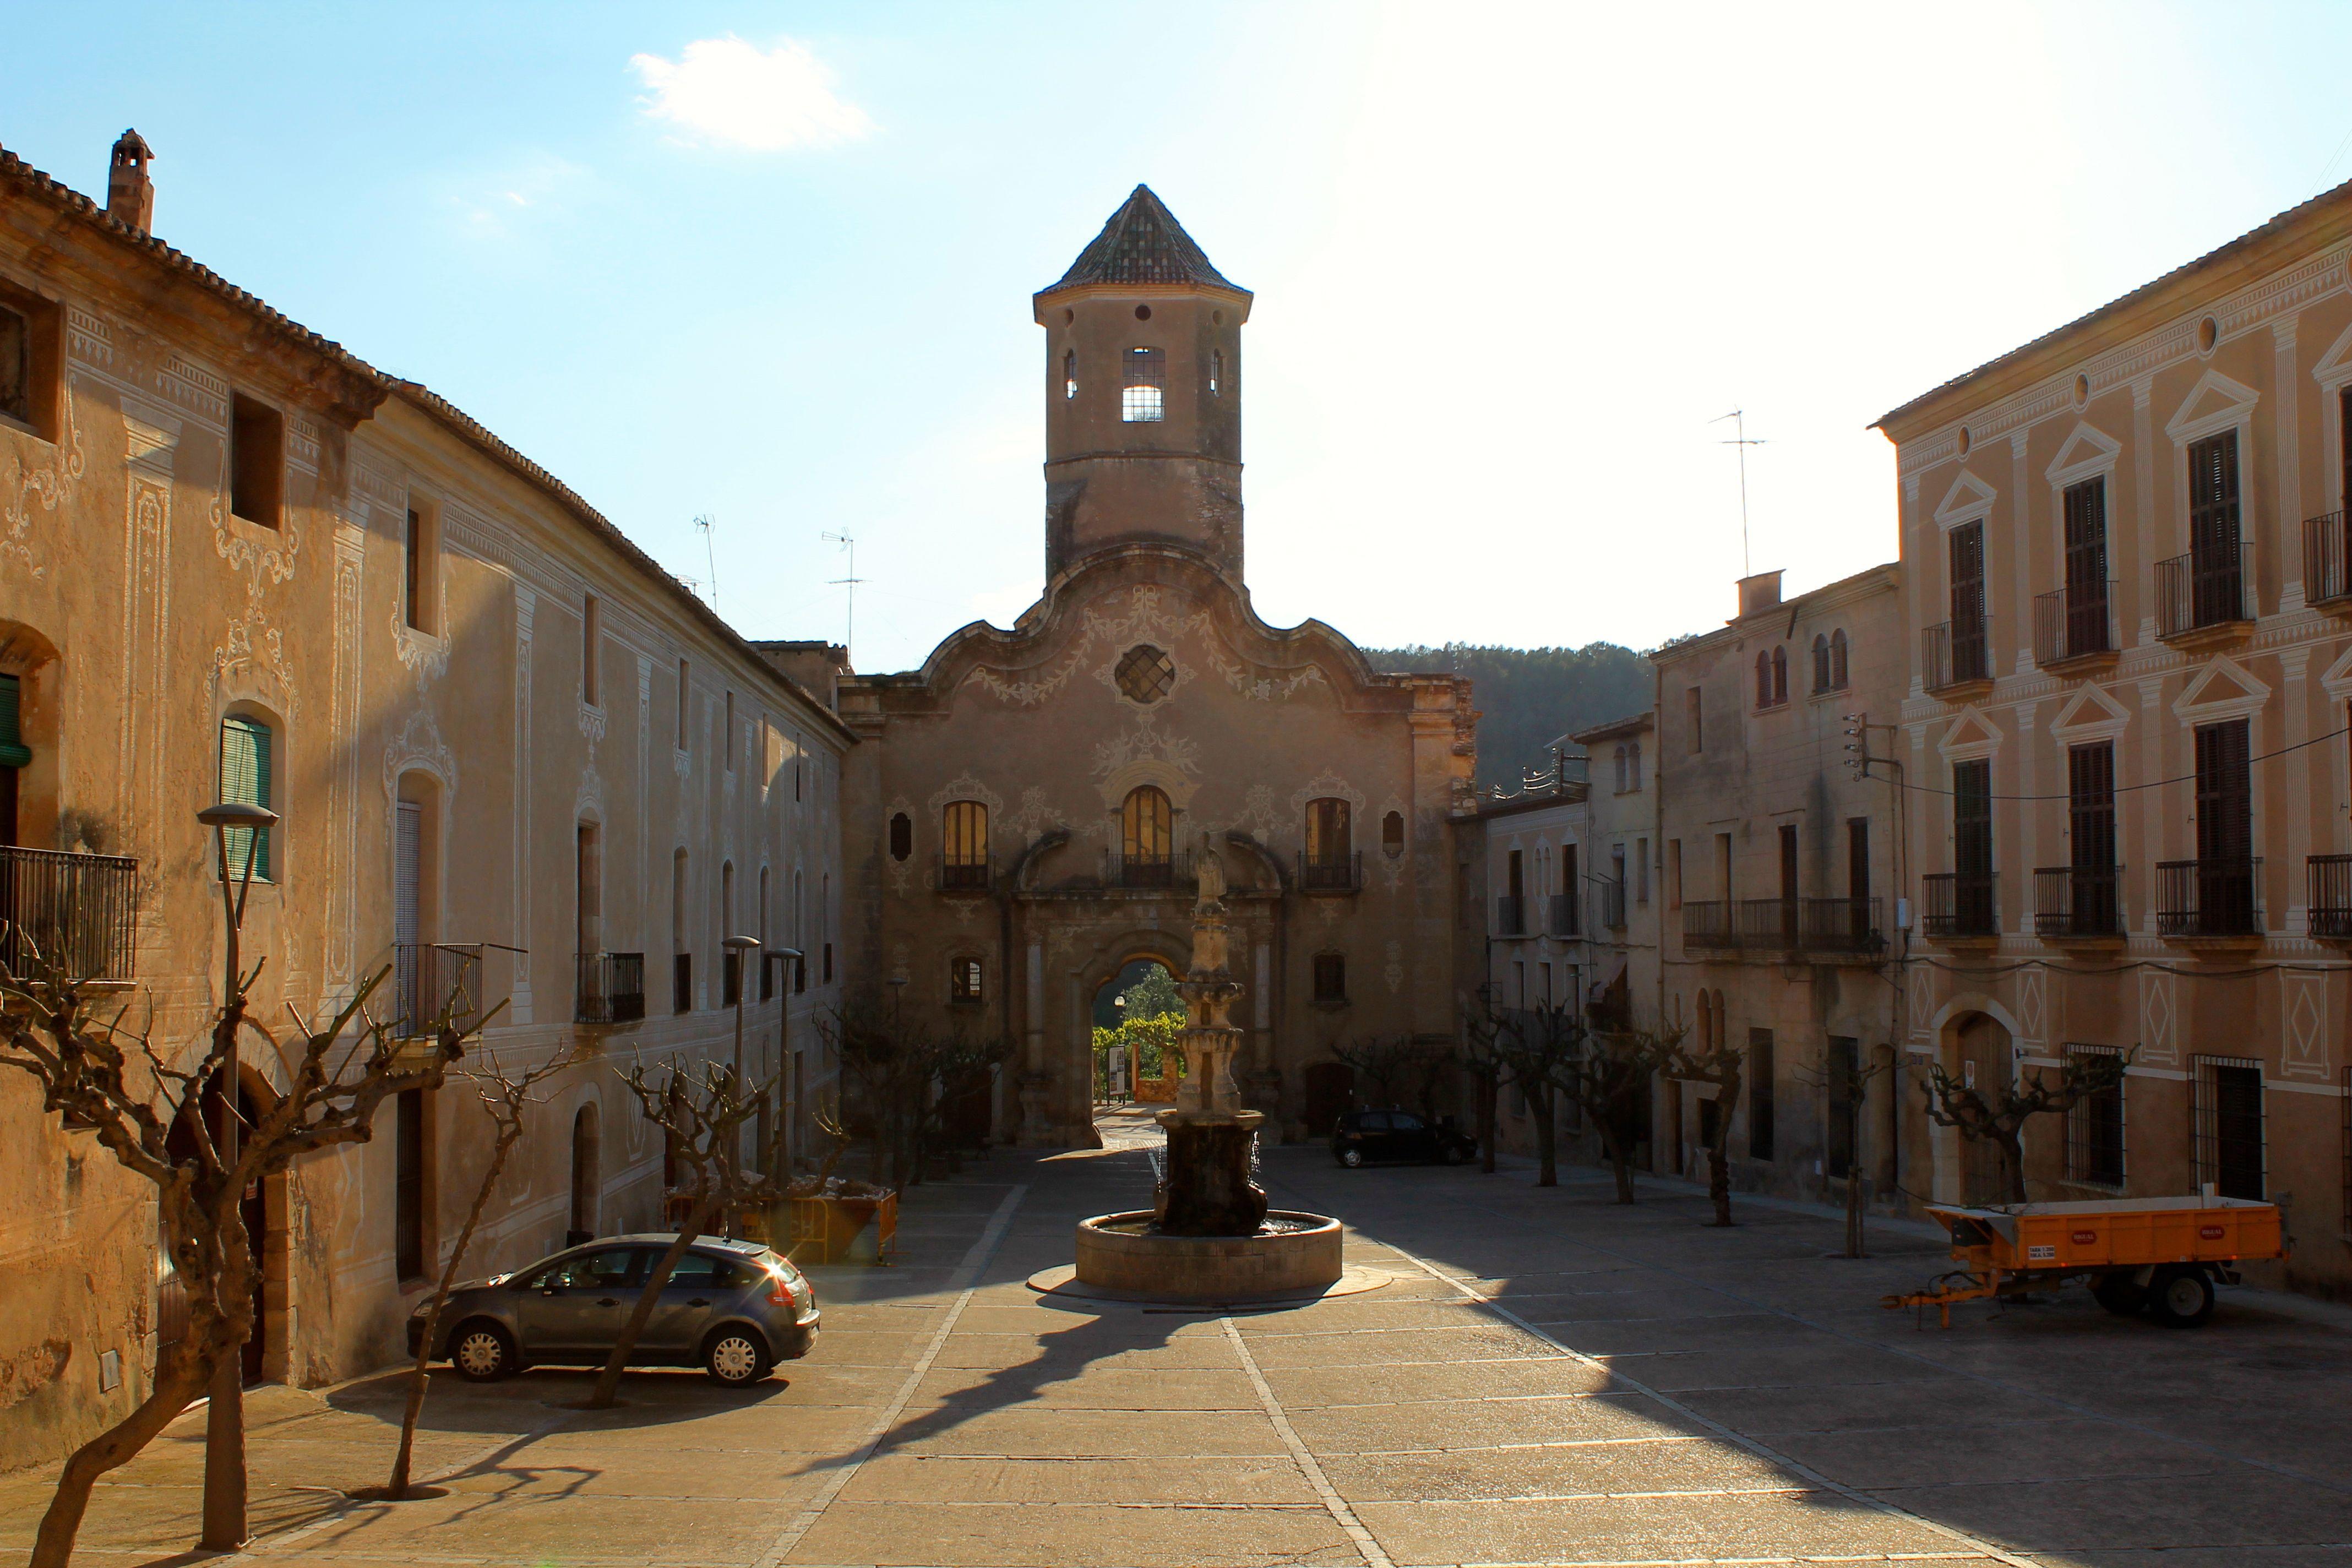 Interior of the Monastery of Santes Creus, Province of Tarragona, Catalonia, Spain for the digital magazine Via Tarraco